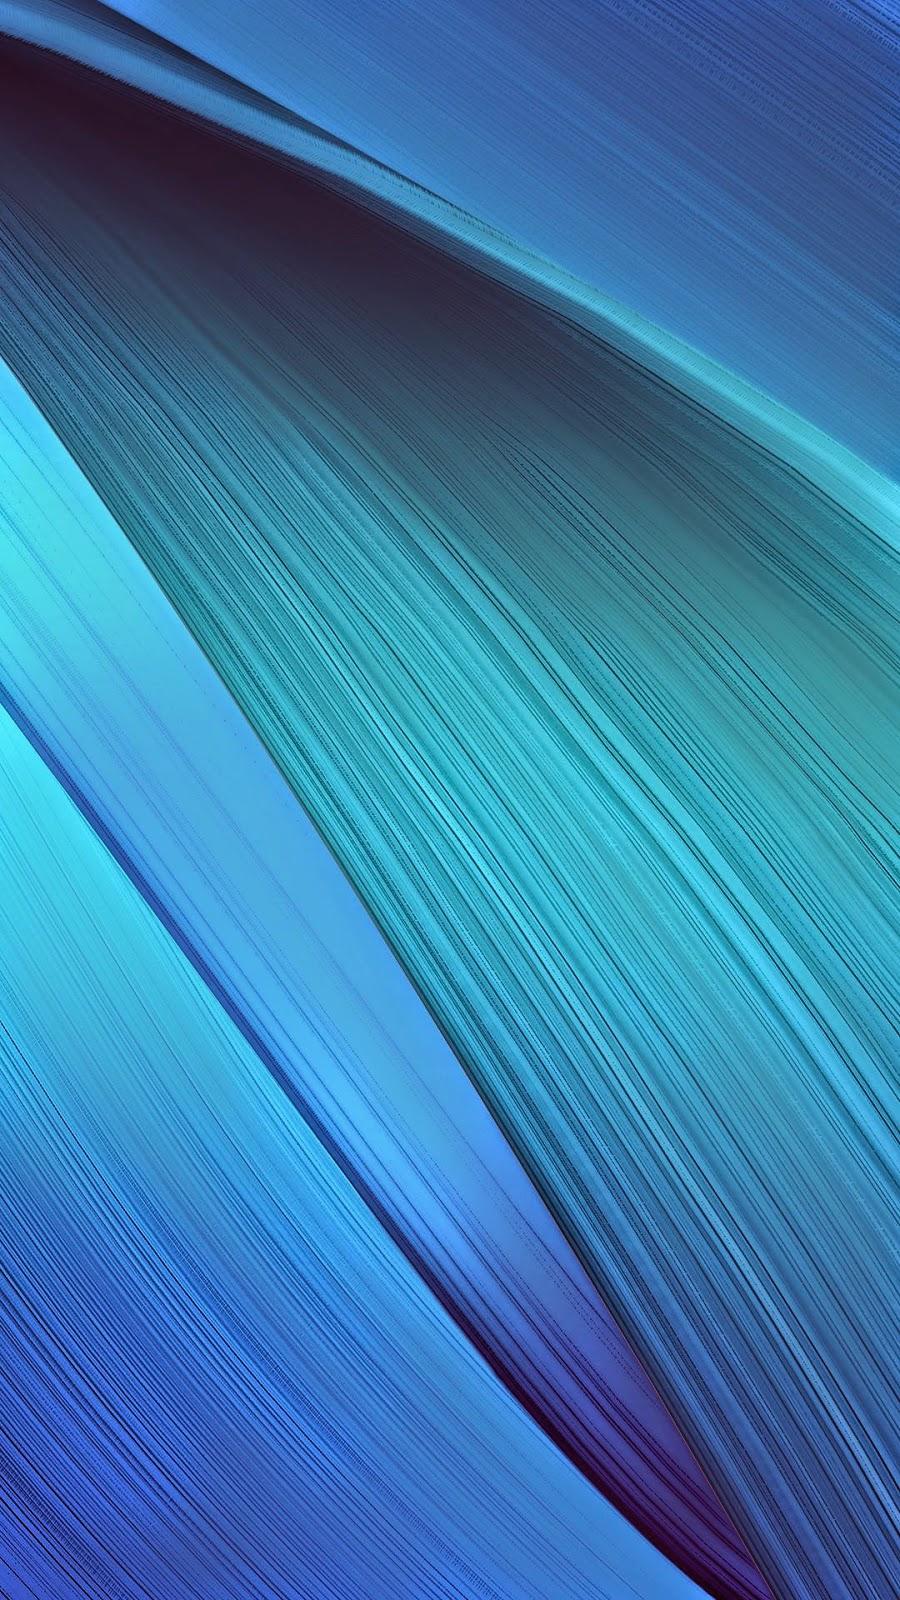 Zenfone 2 Wallpapers da Semana 2